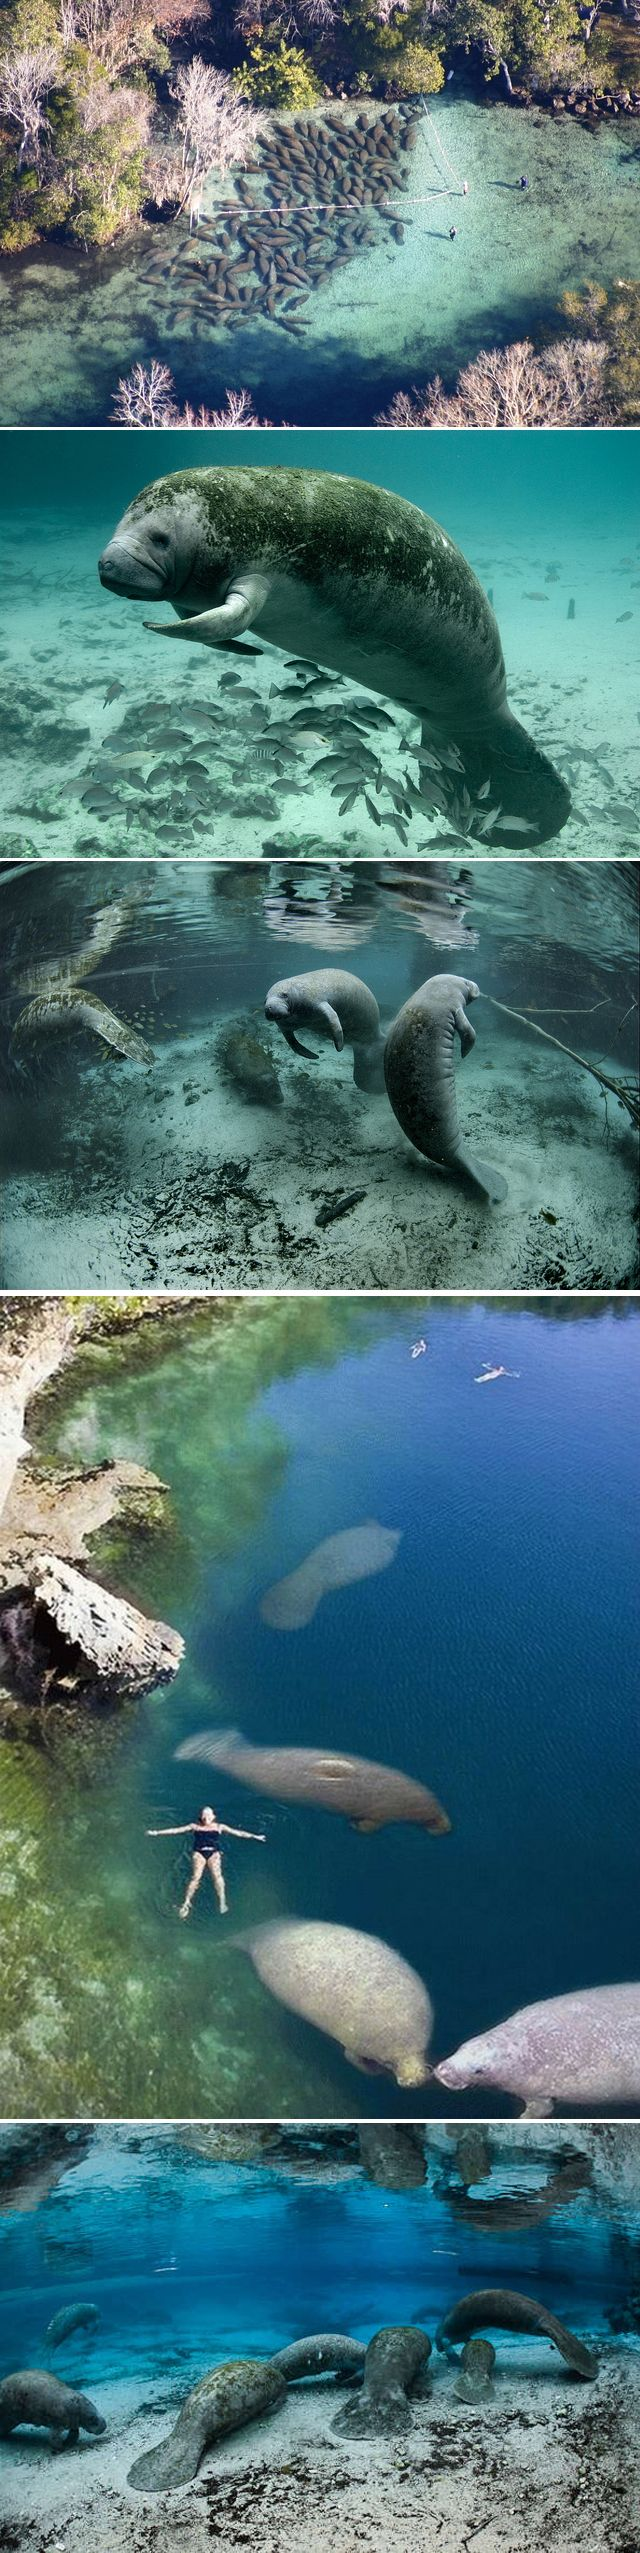 Manatee migration, Crystal River, Kings Bay, Florida.